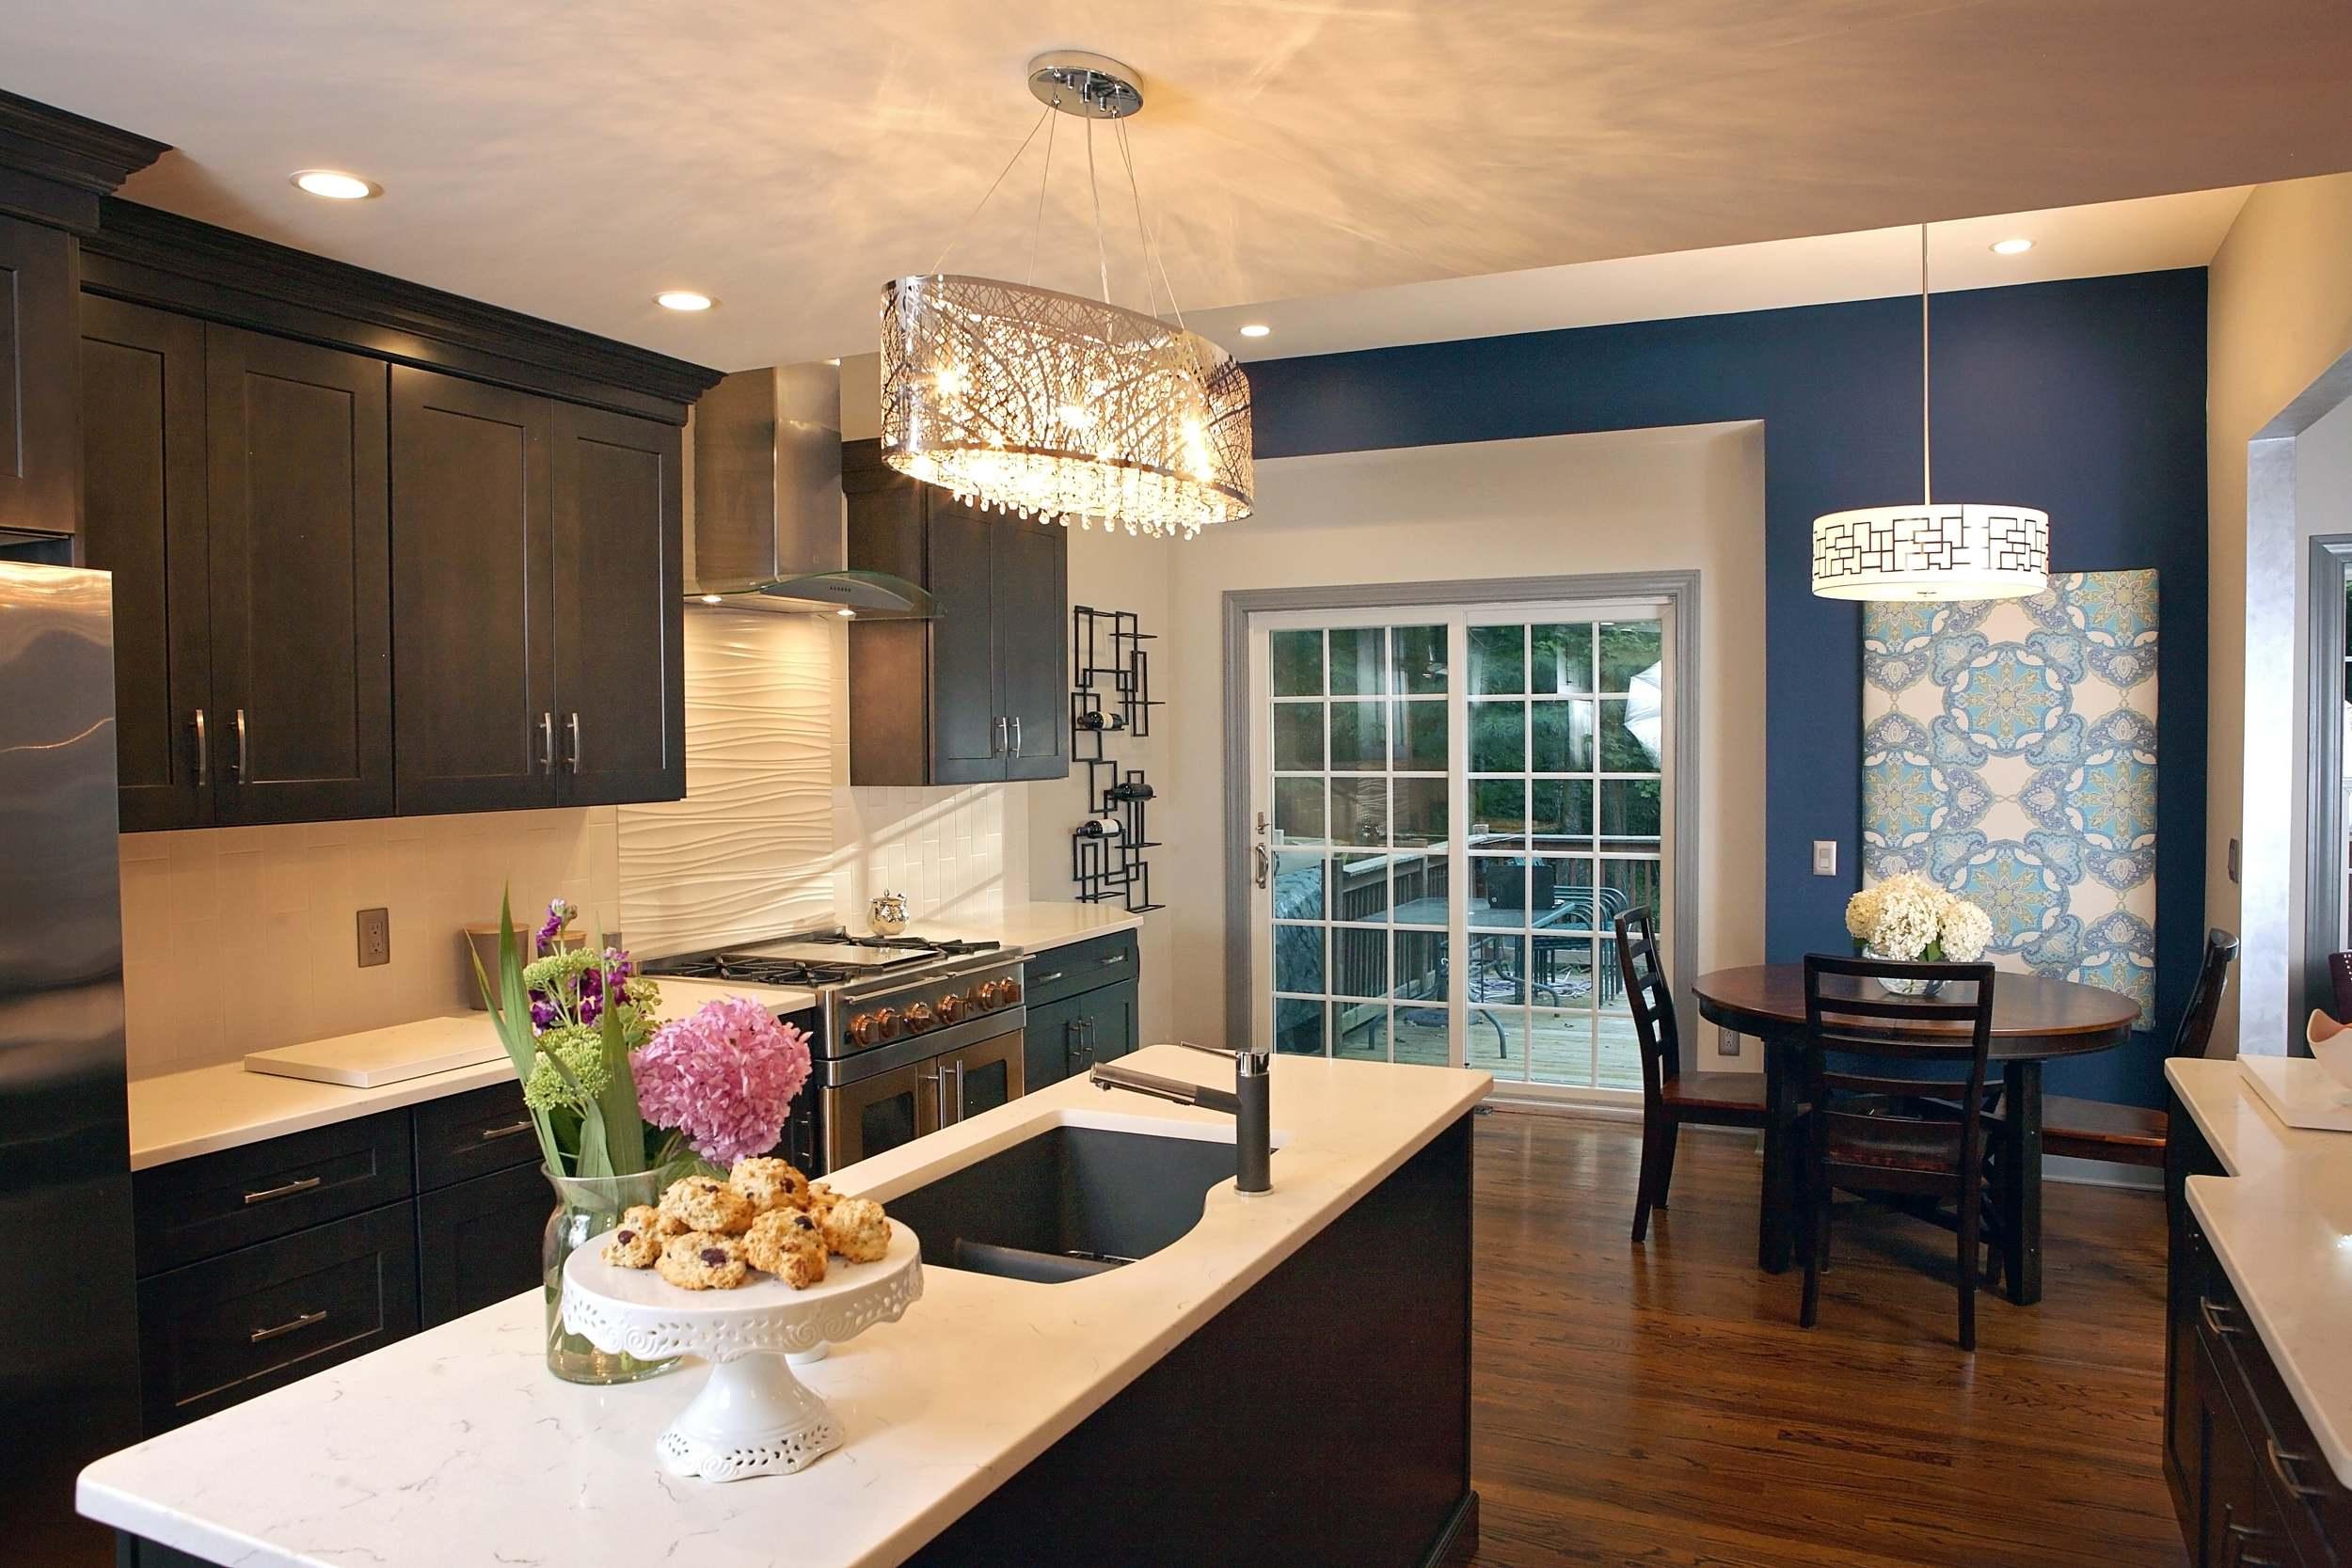 Modern Kitchen Ballston Spa NY 12020